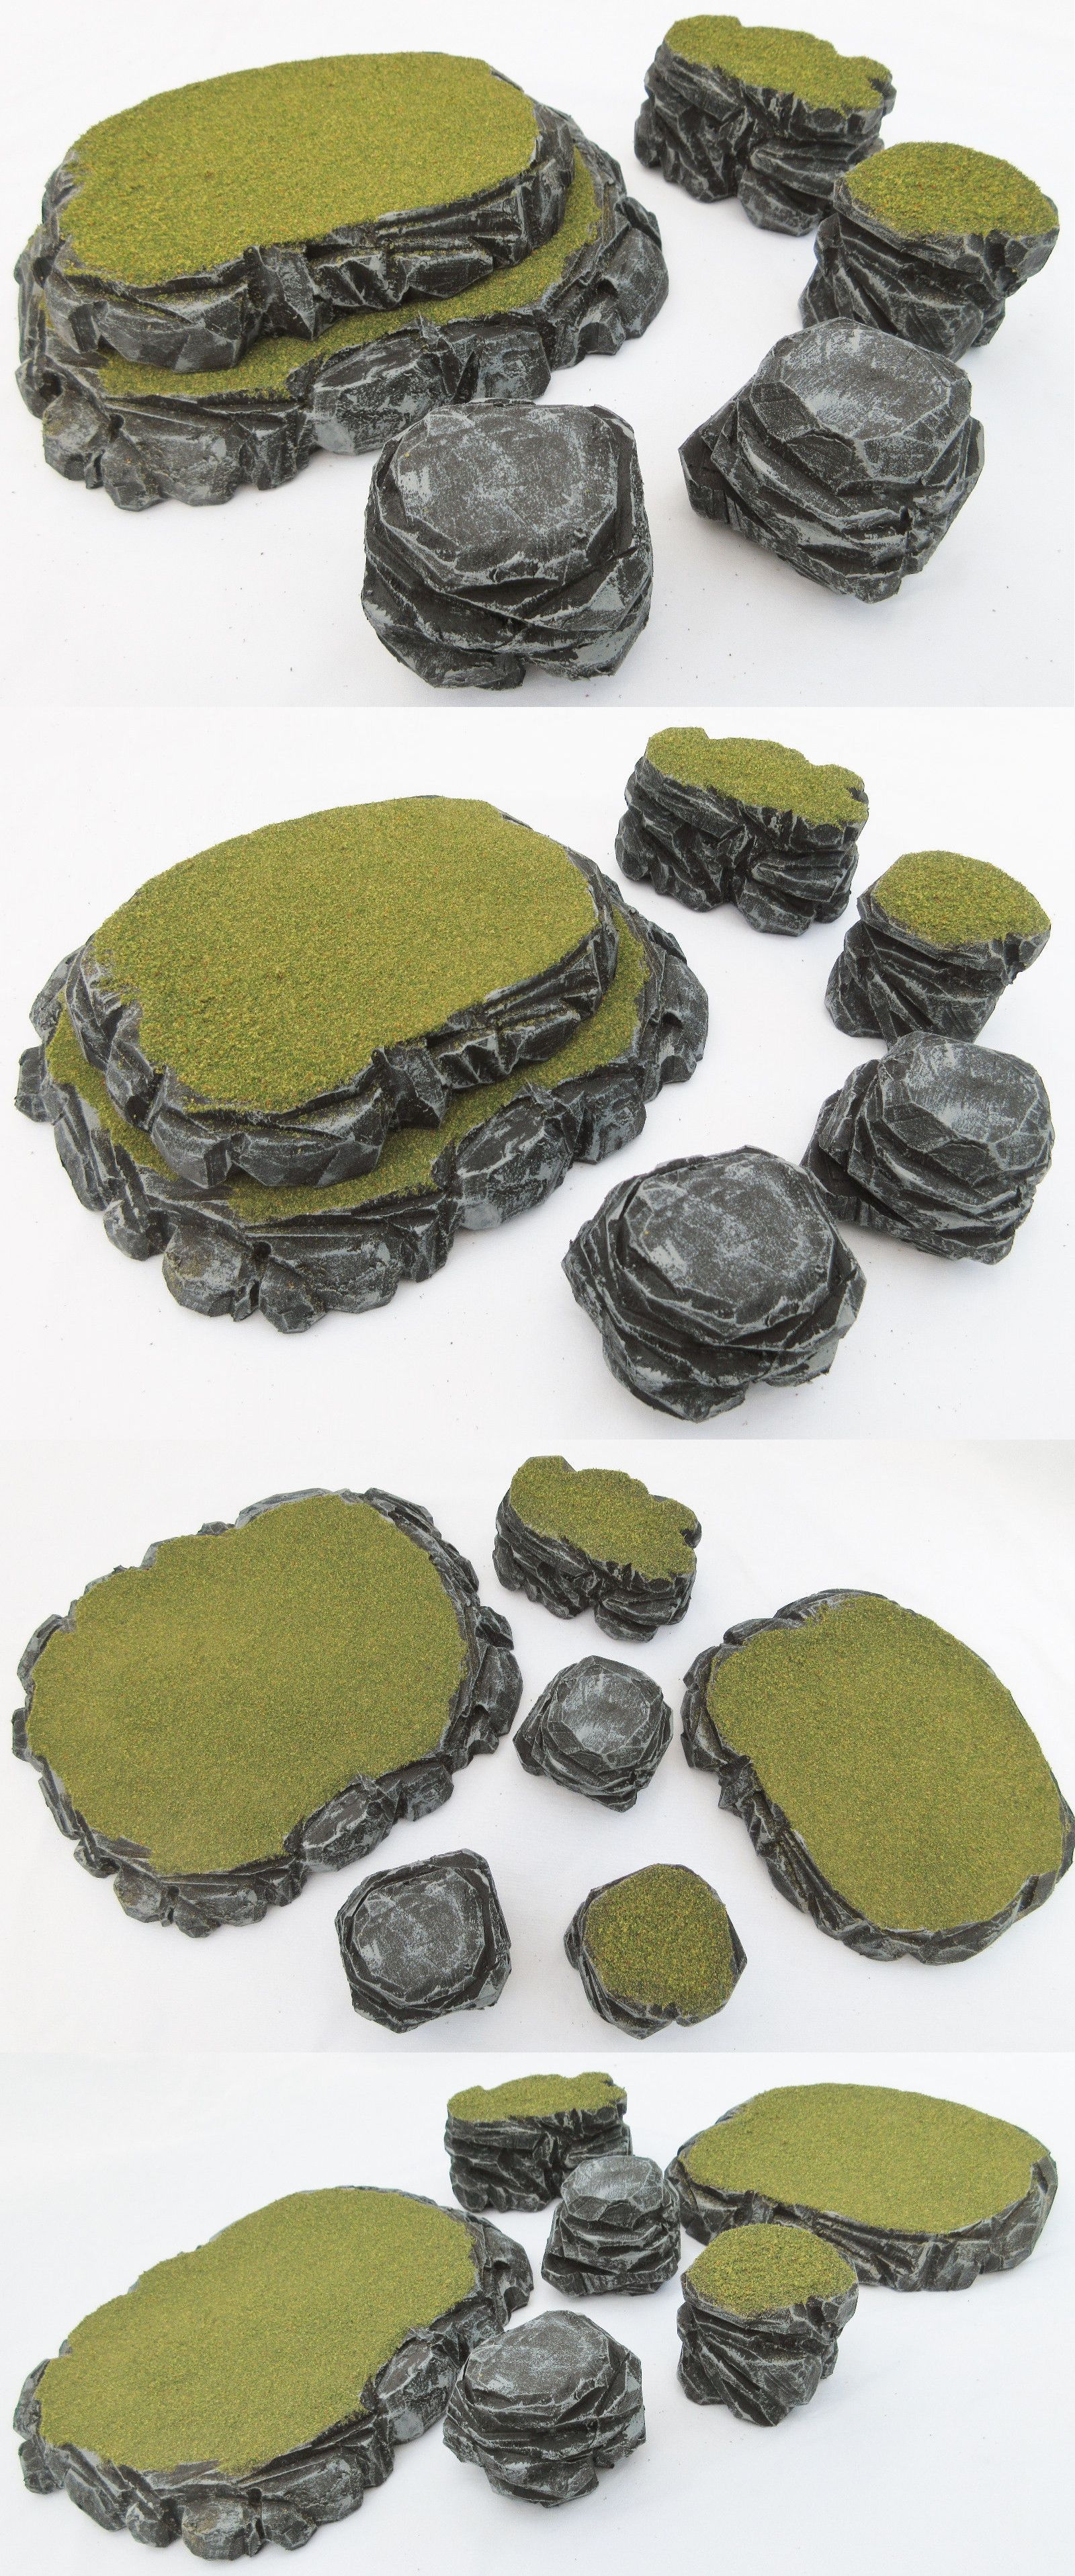 40K Terrain and Scenery 152940: Warhammer 40K Tabletop Wargaming Terrain Scenery Grey Stone Plateau And Rocks Seta -> BUY IT NOW ONLY: $30.76 on eBay! #wargamingterrain